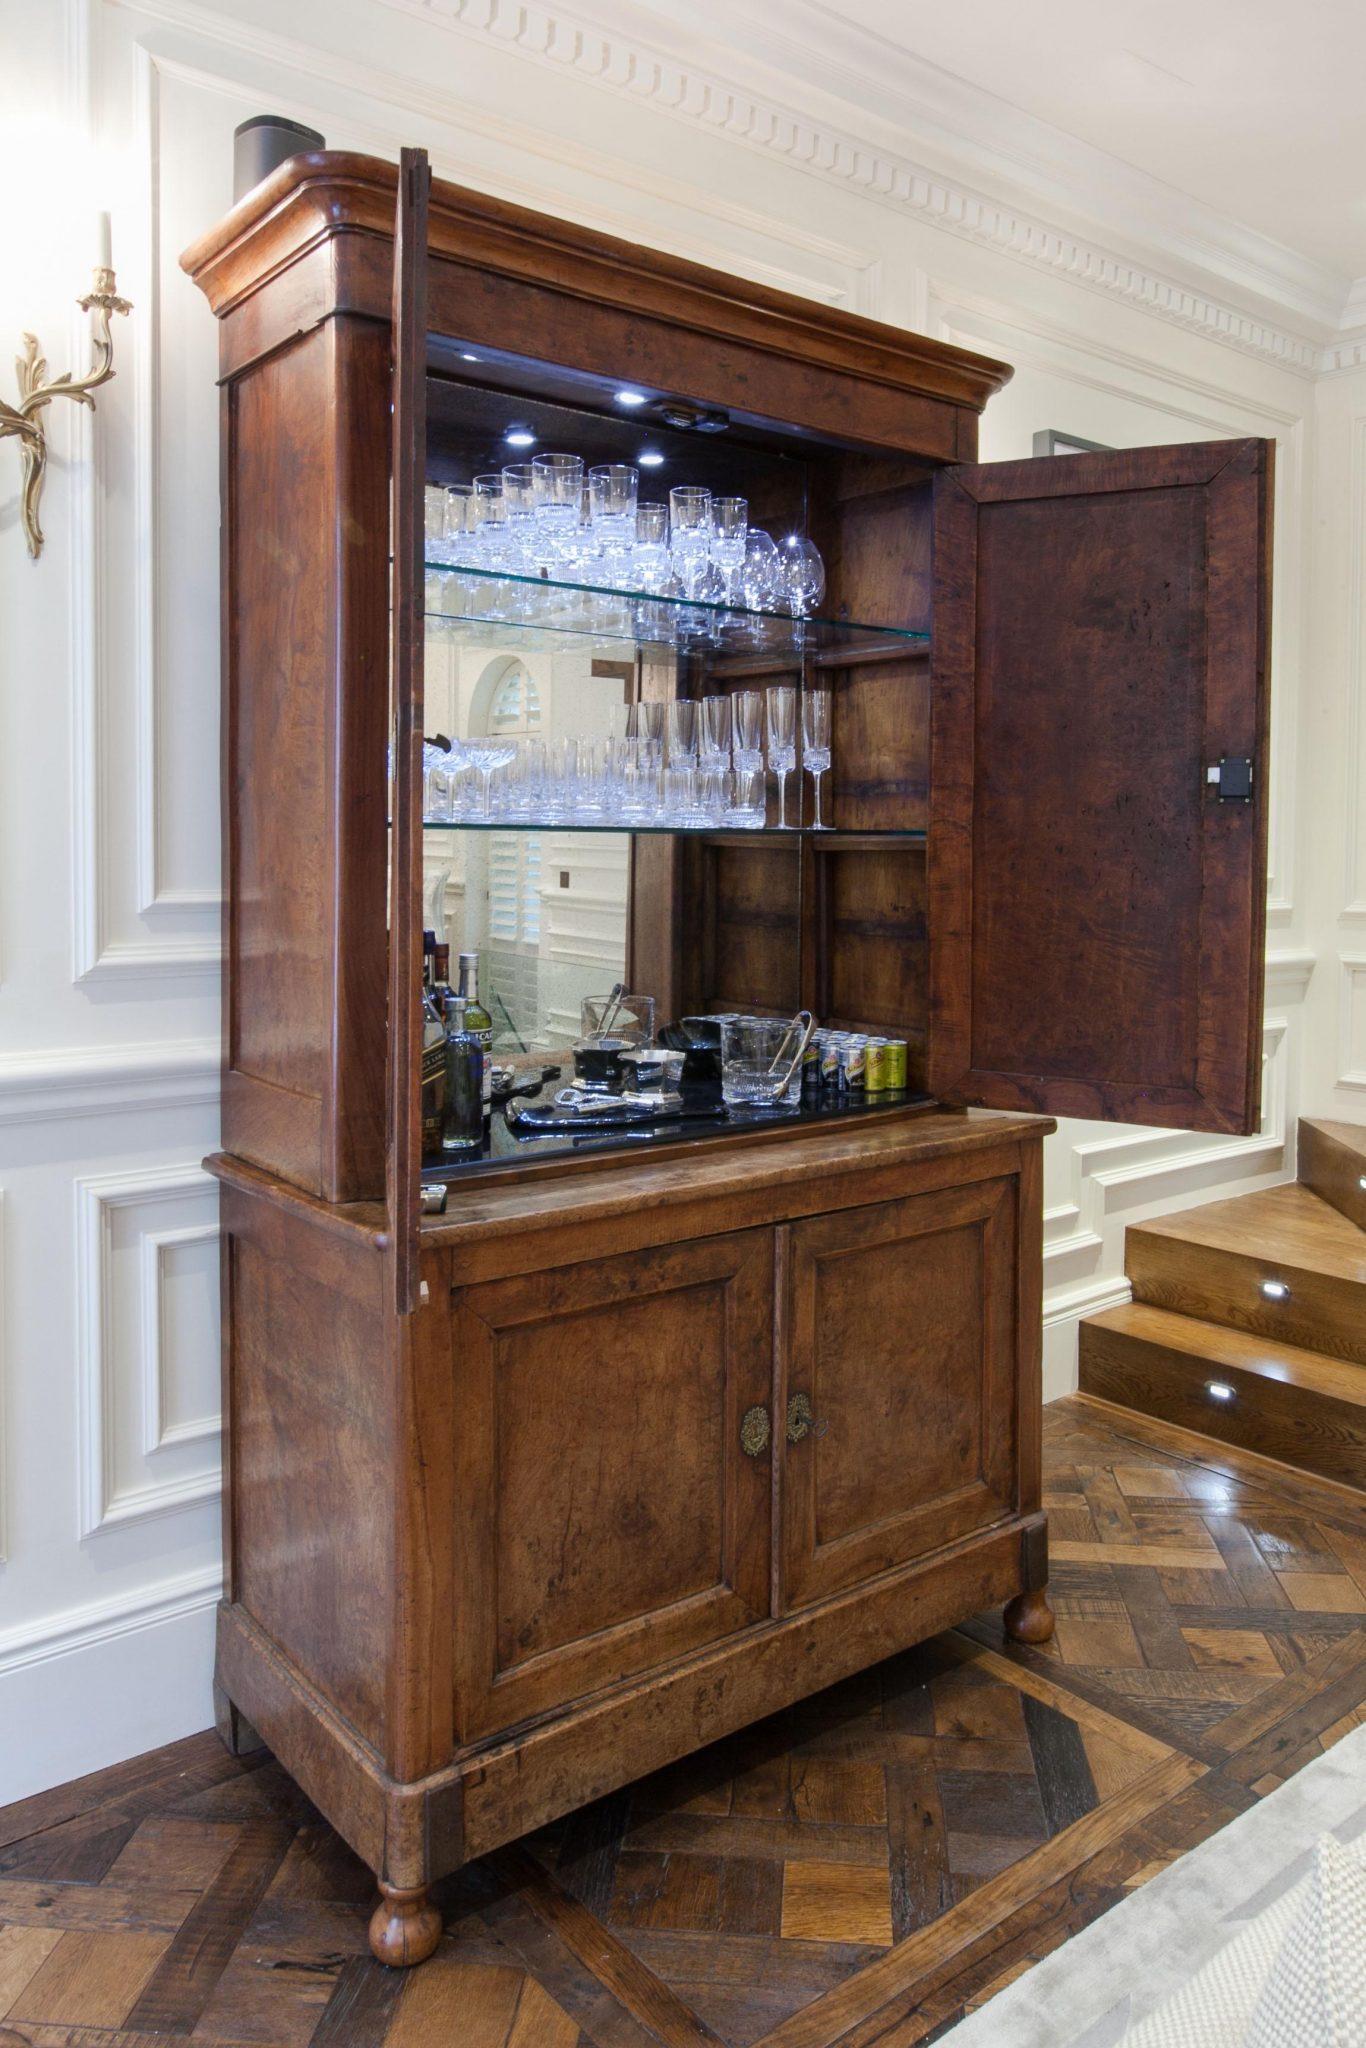 Thomson Carpenter living room ideas